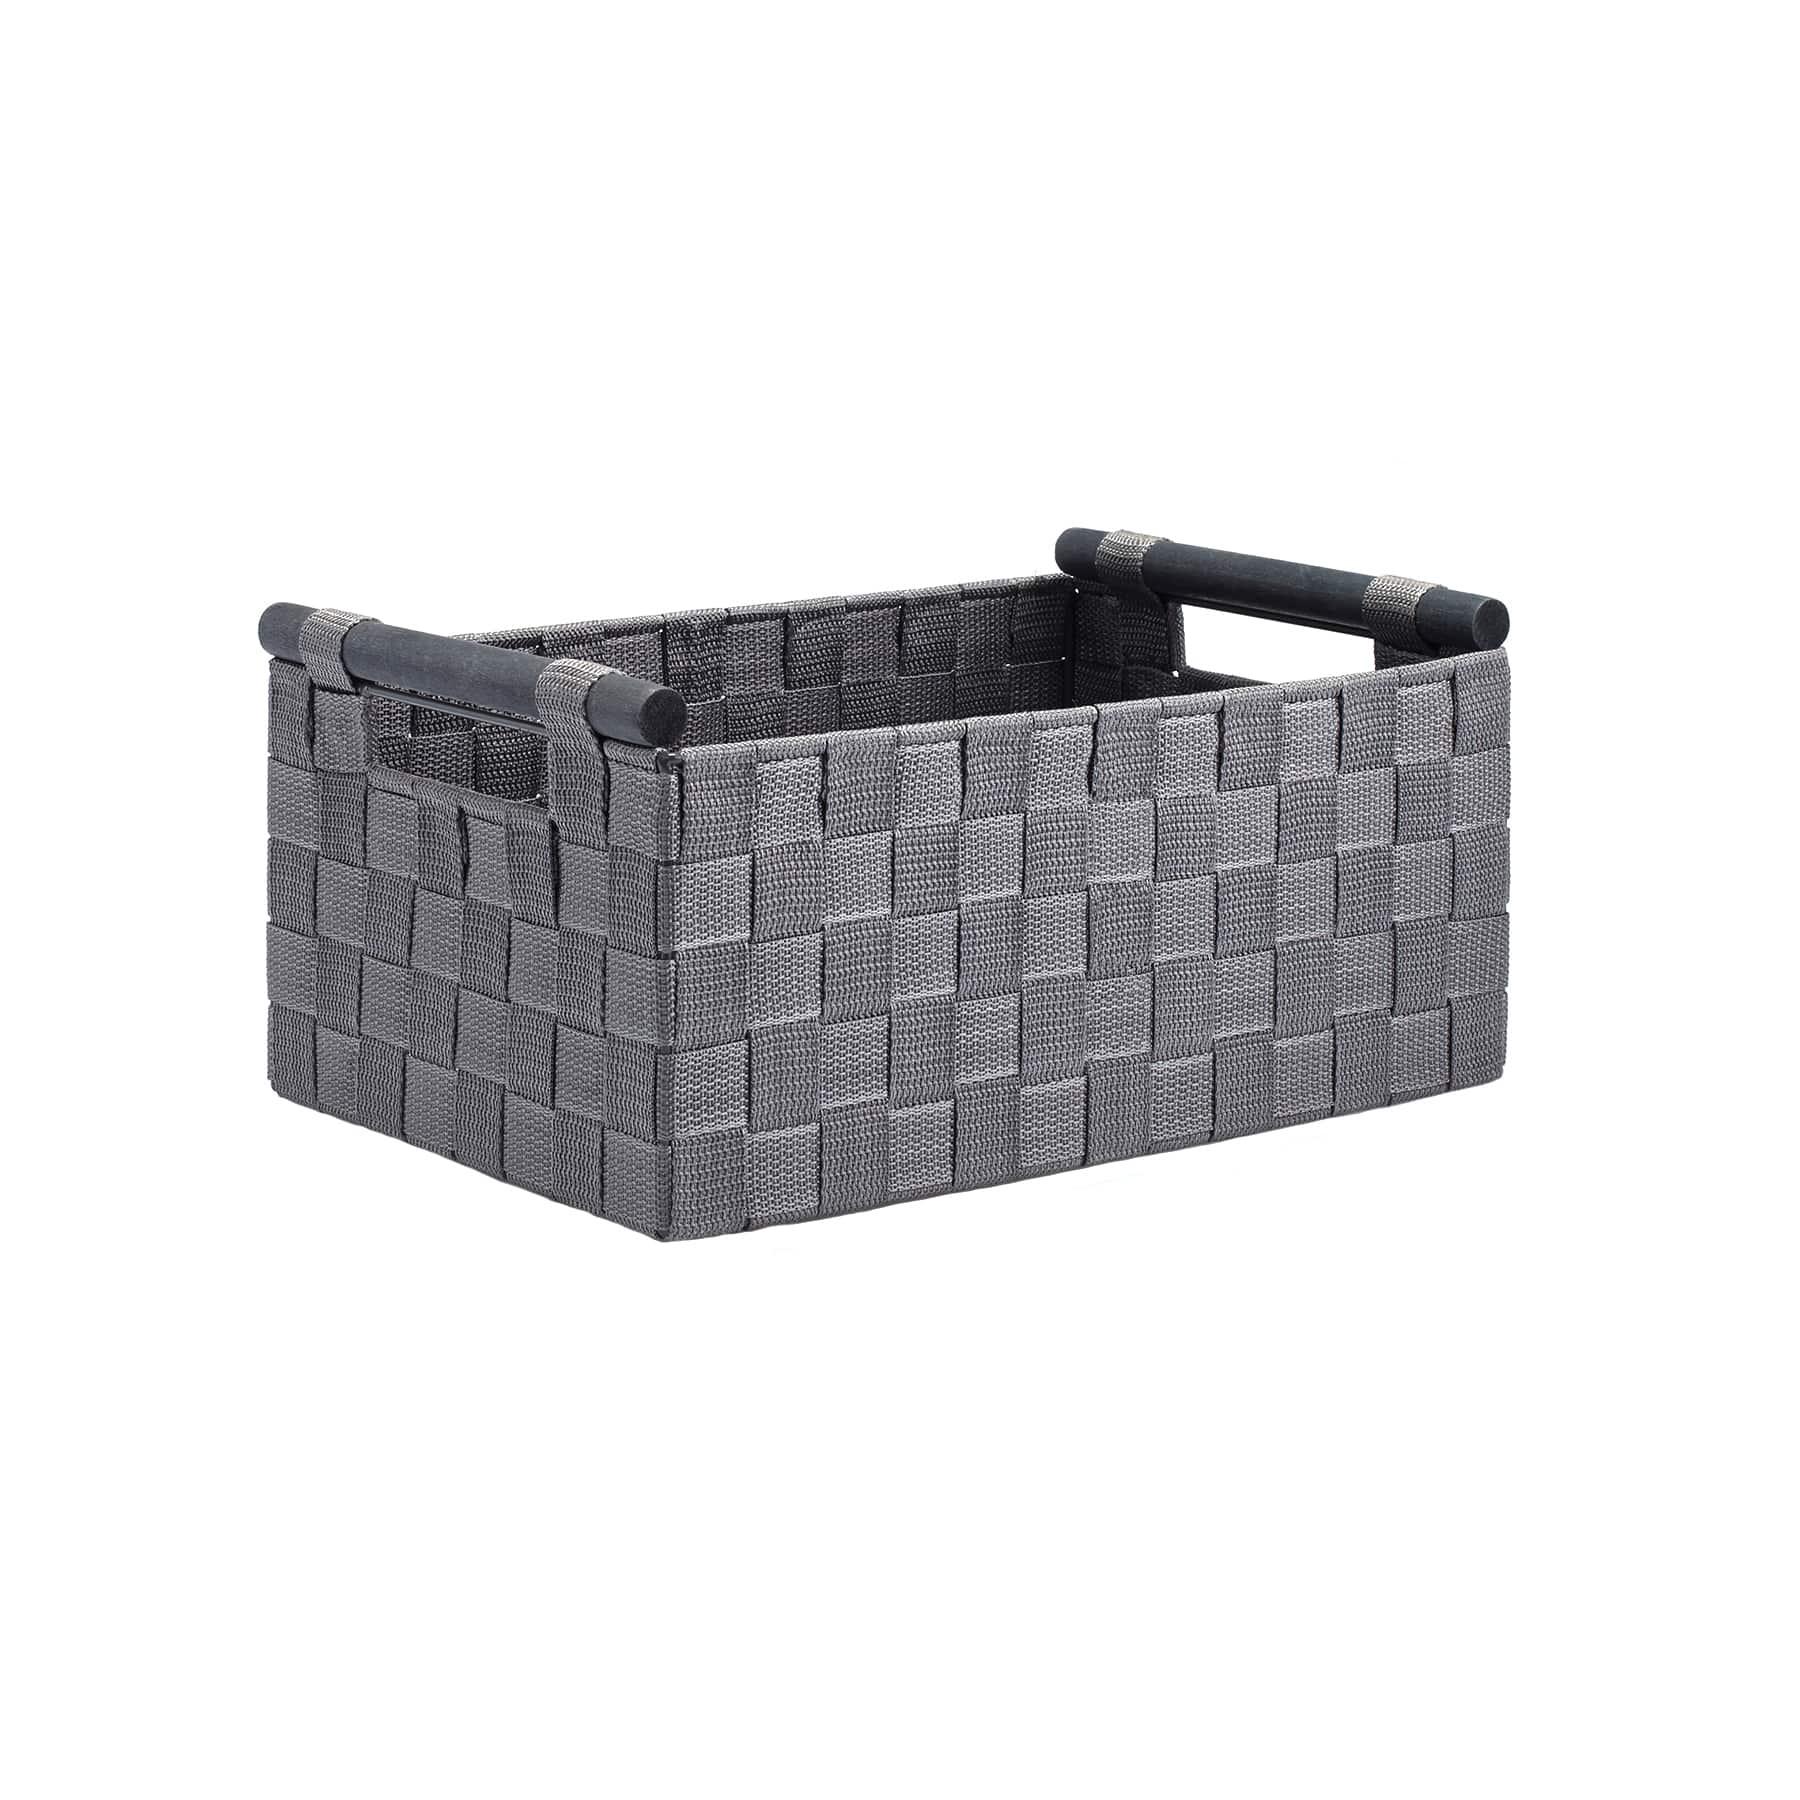 Gray Nylon Storage Basket With Wood Handles By Ashland®